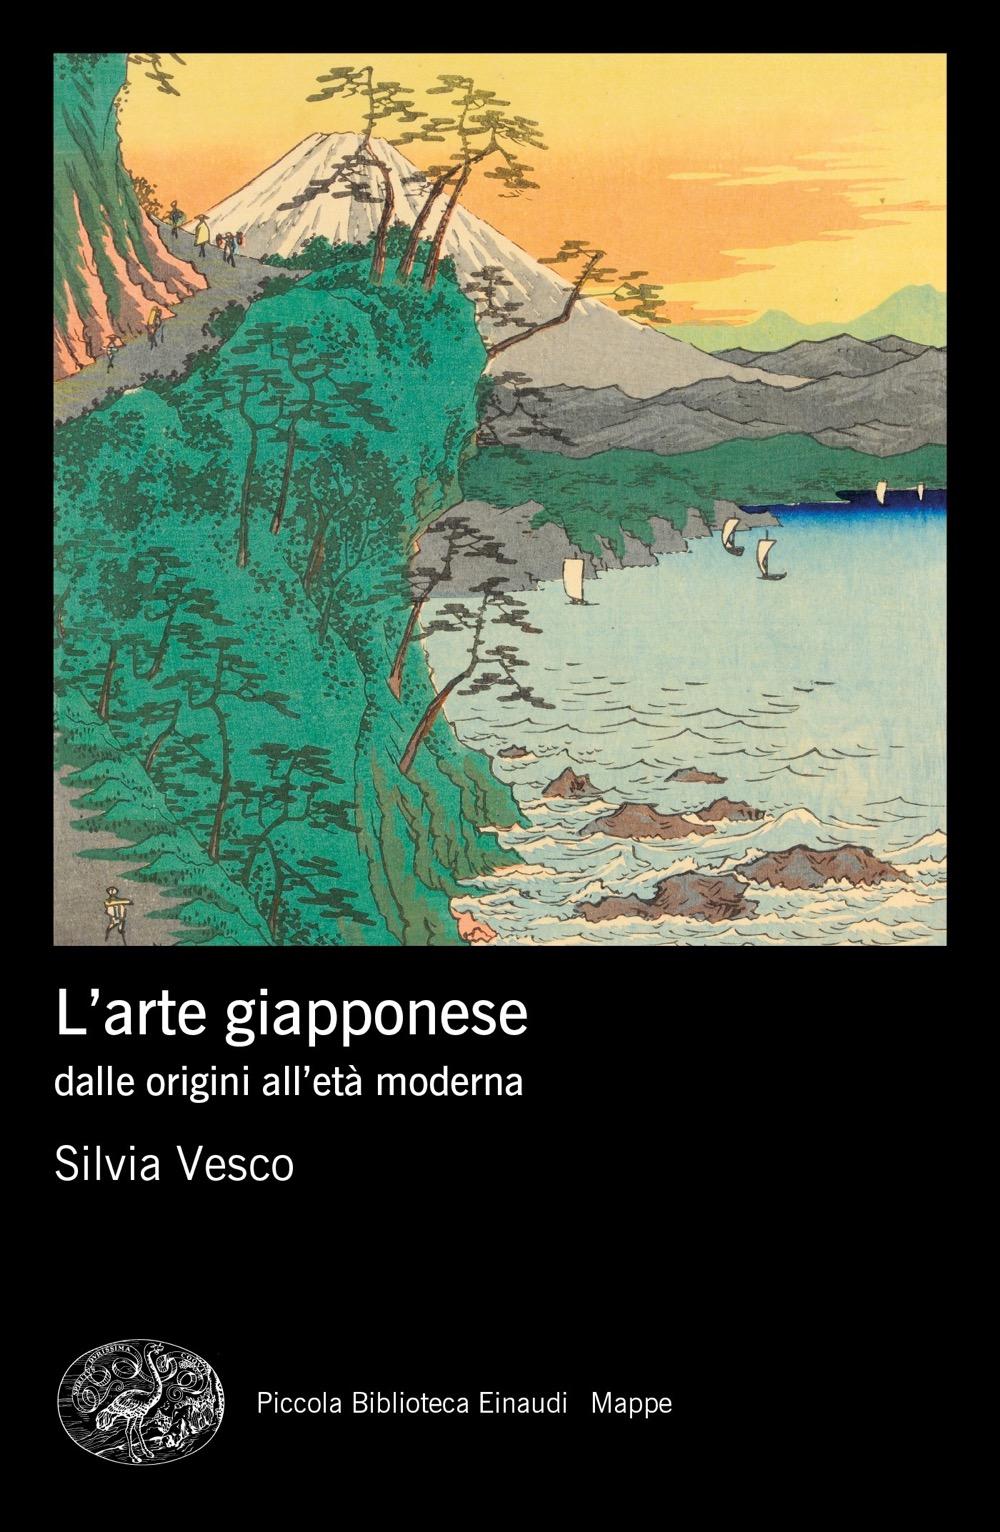 L'arte giapponese, Silvia Vesco. Giulio Einaudi Editore - Piccola  Biblioteca Einaudi. Mappe